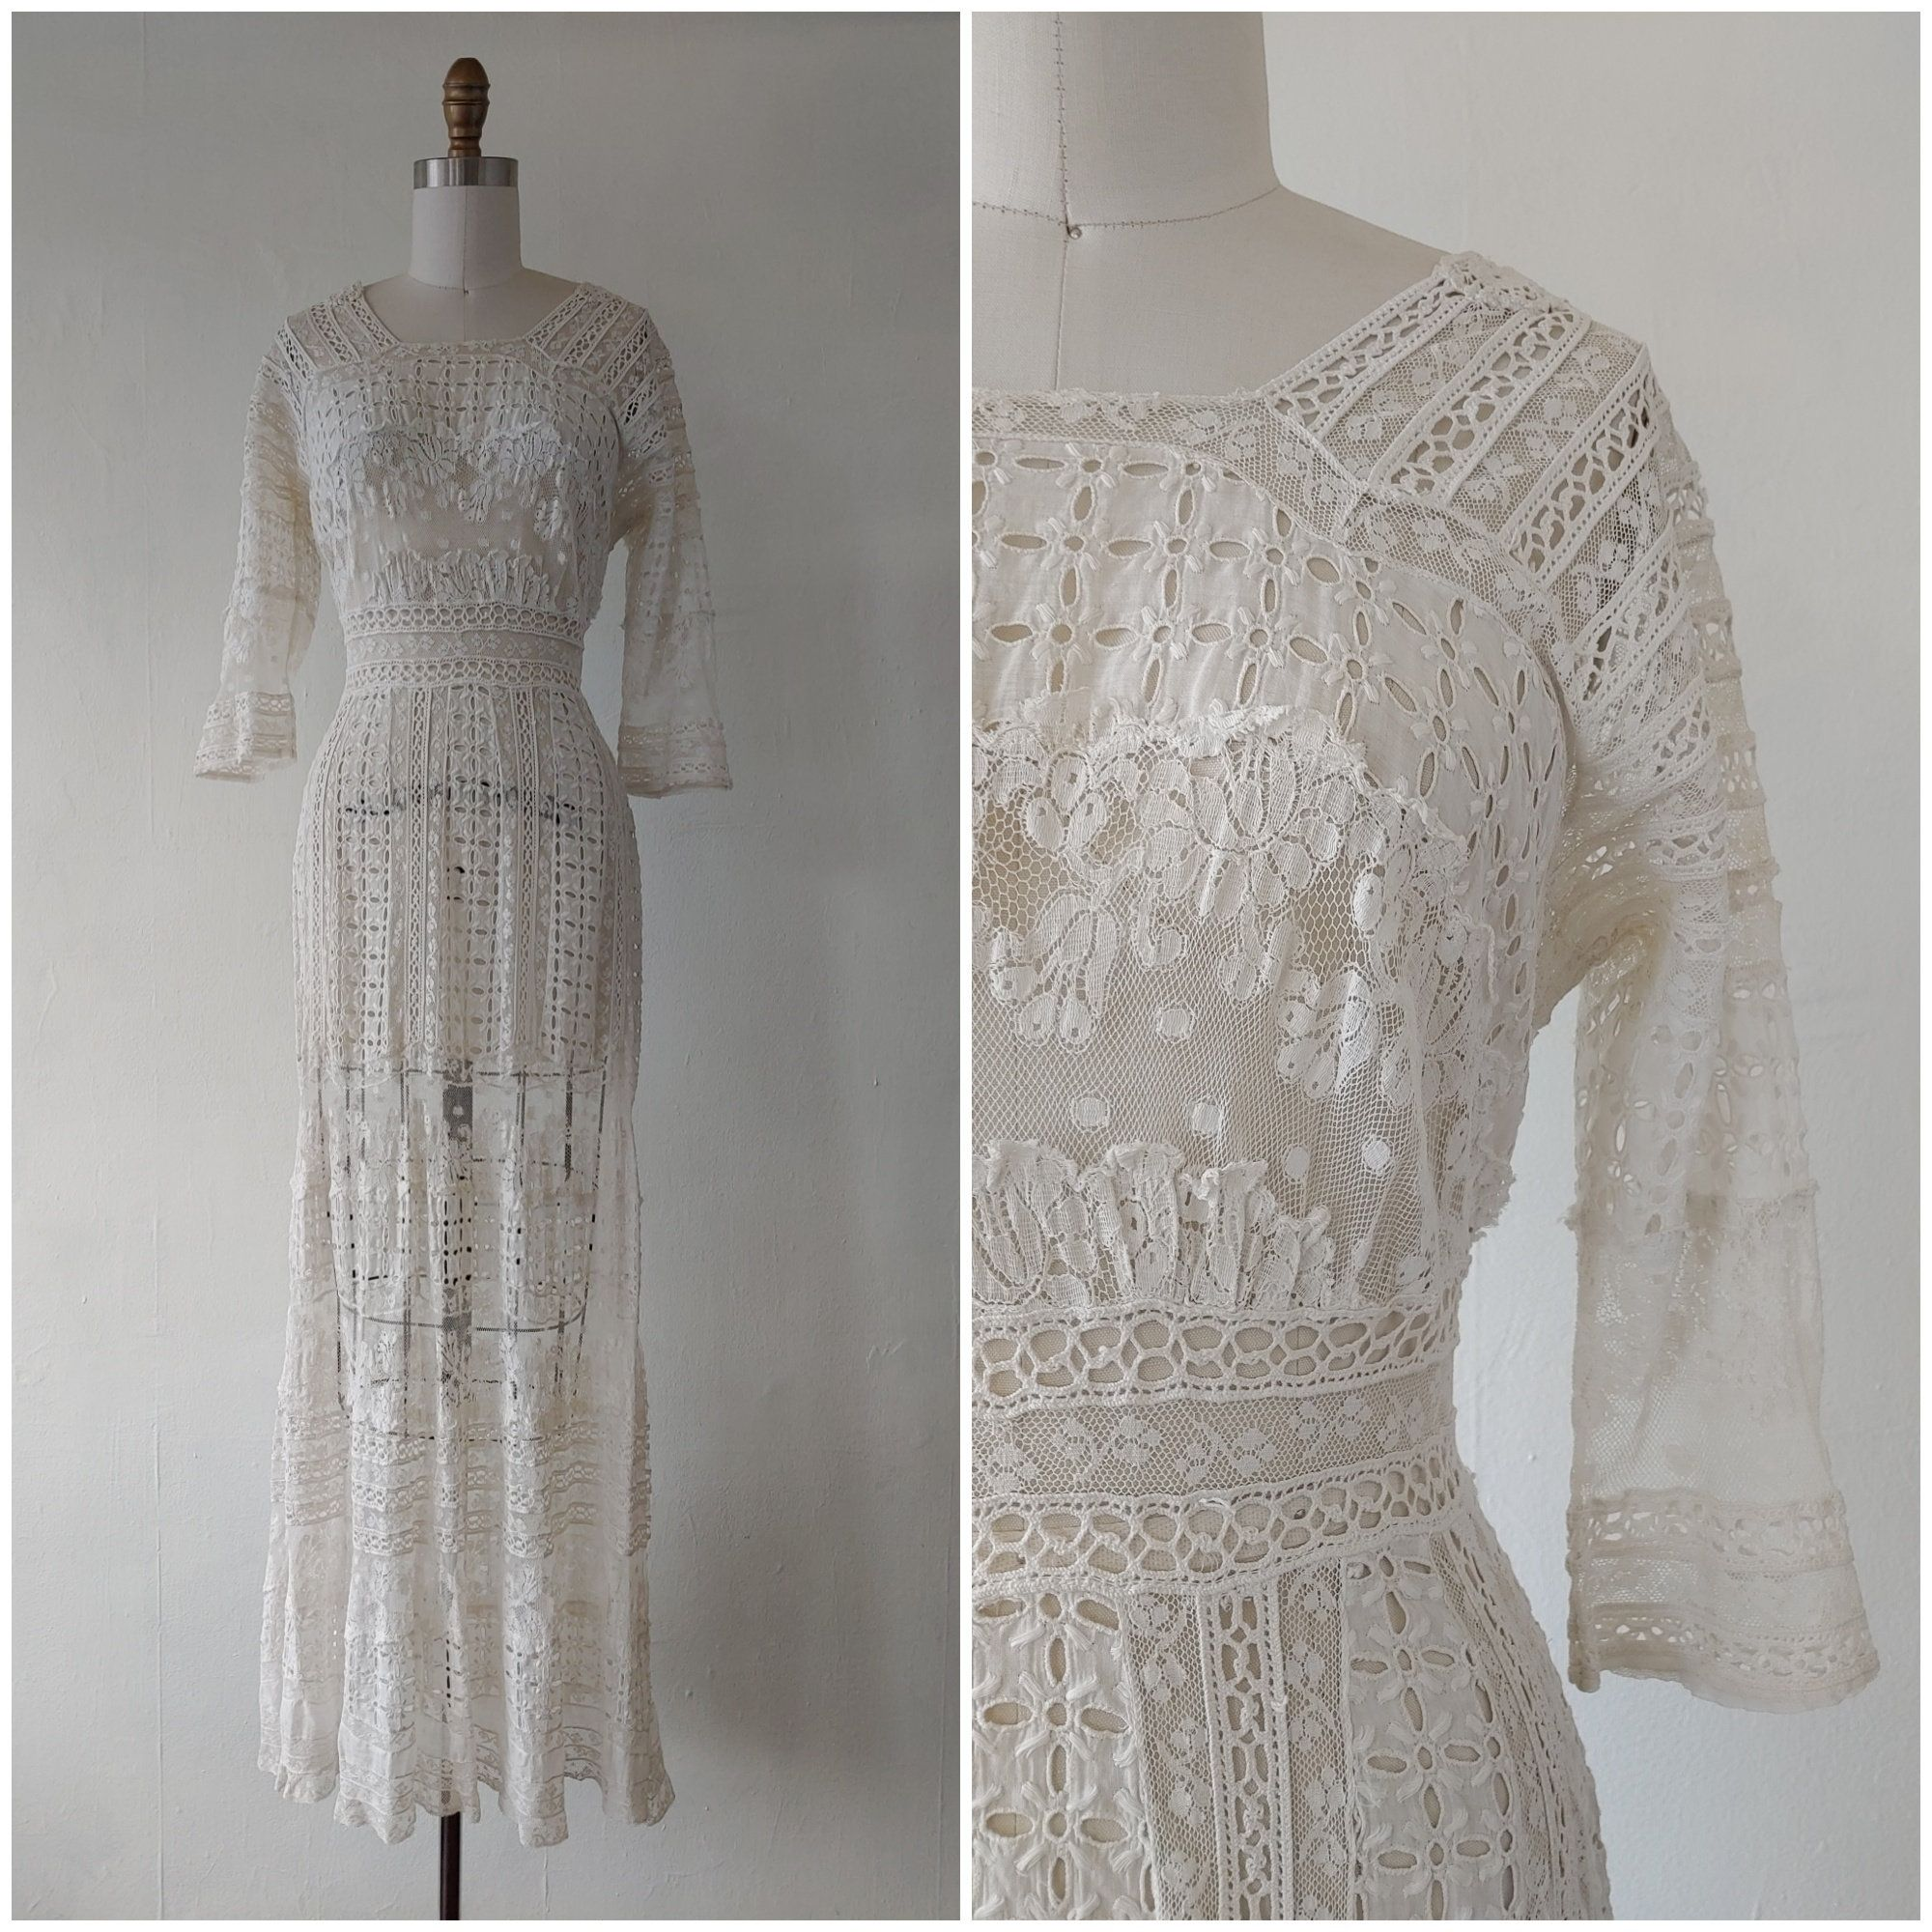 1910s White Lace Dress Antique Edwardian 1910s White Eyelet Etsy Lace White Dress White Lace Wedding Dress Lace Wedding Dress Vintage [ 2000 x 2000 Pixel ]